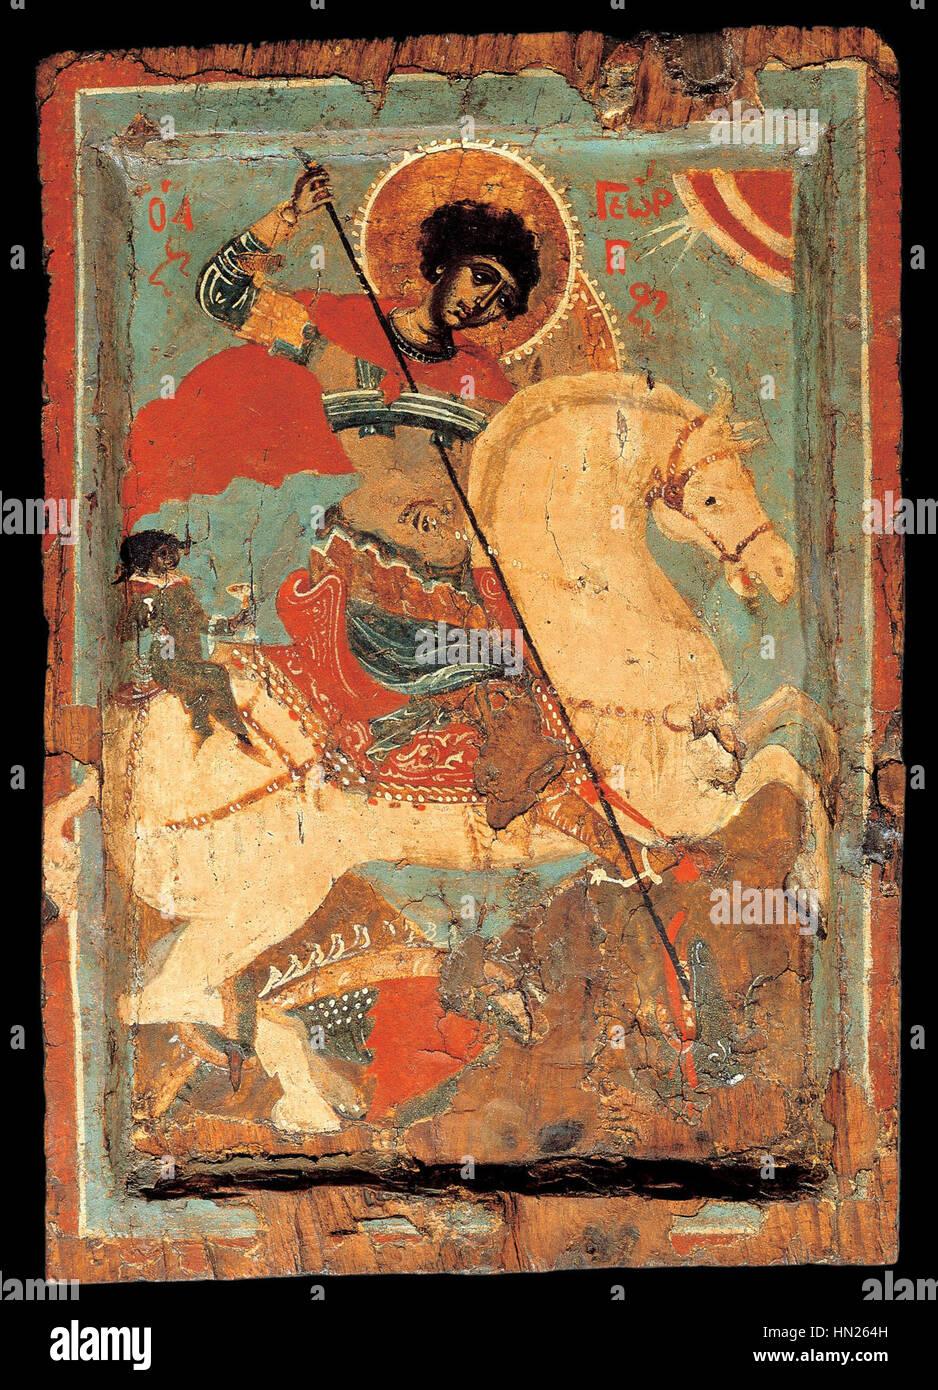 Macedonian workshop - St George the dragon-slayer on horseback - Google Art Project Stock Photo